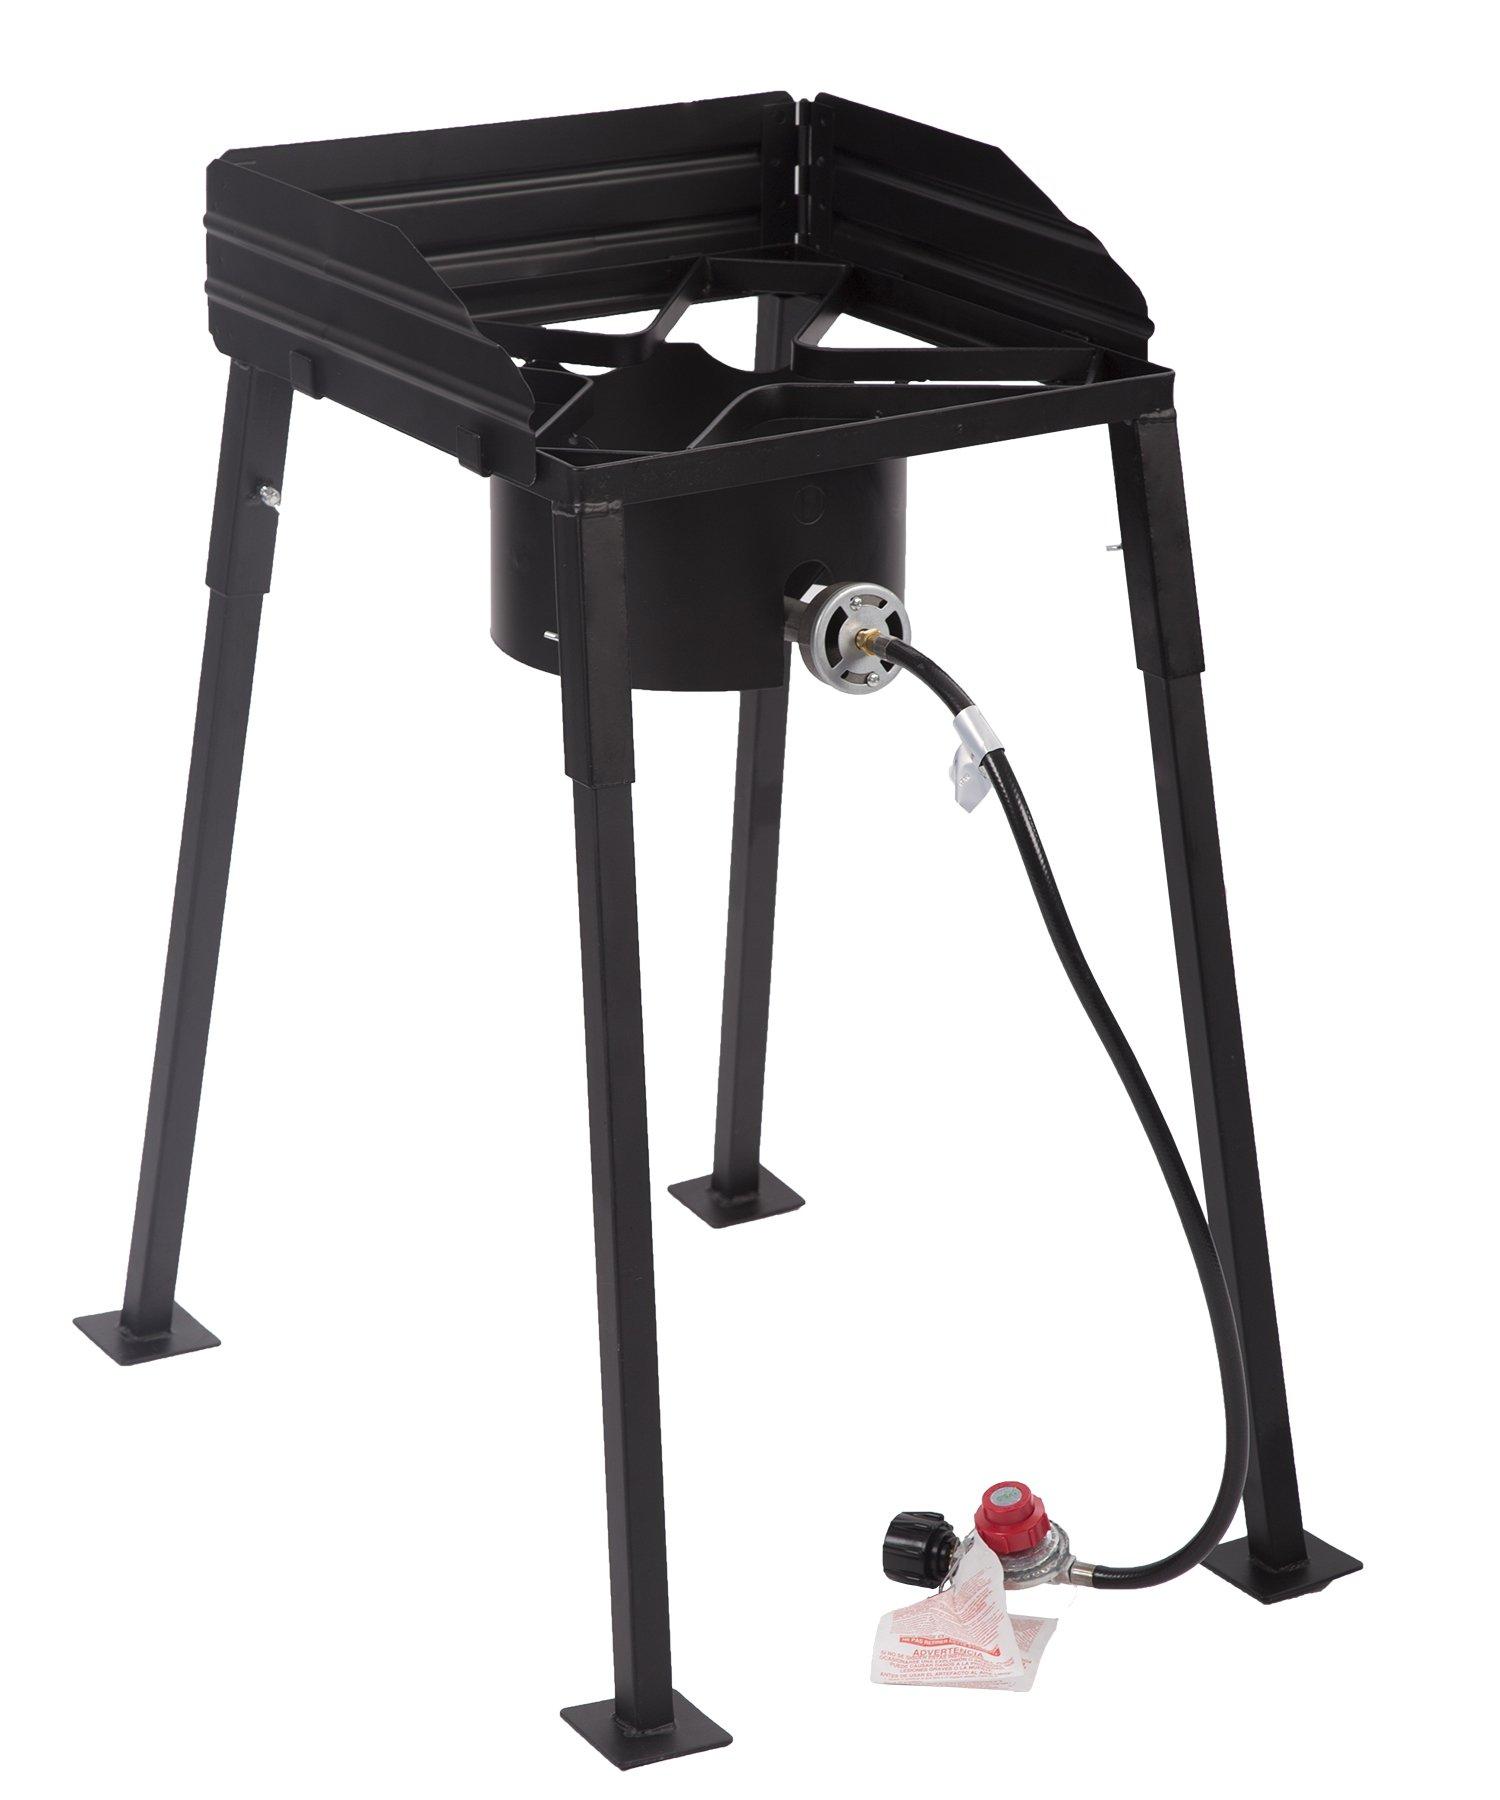 BestMassage Outdoor Propane Cooker Portable Propane High-Pressure Single-Burner Outdoor Camp Stove Single Burner Gas Patio Cooker